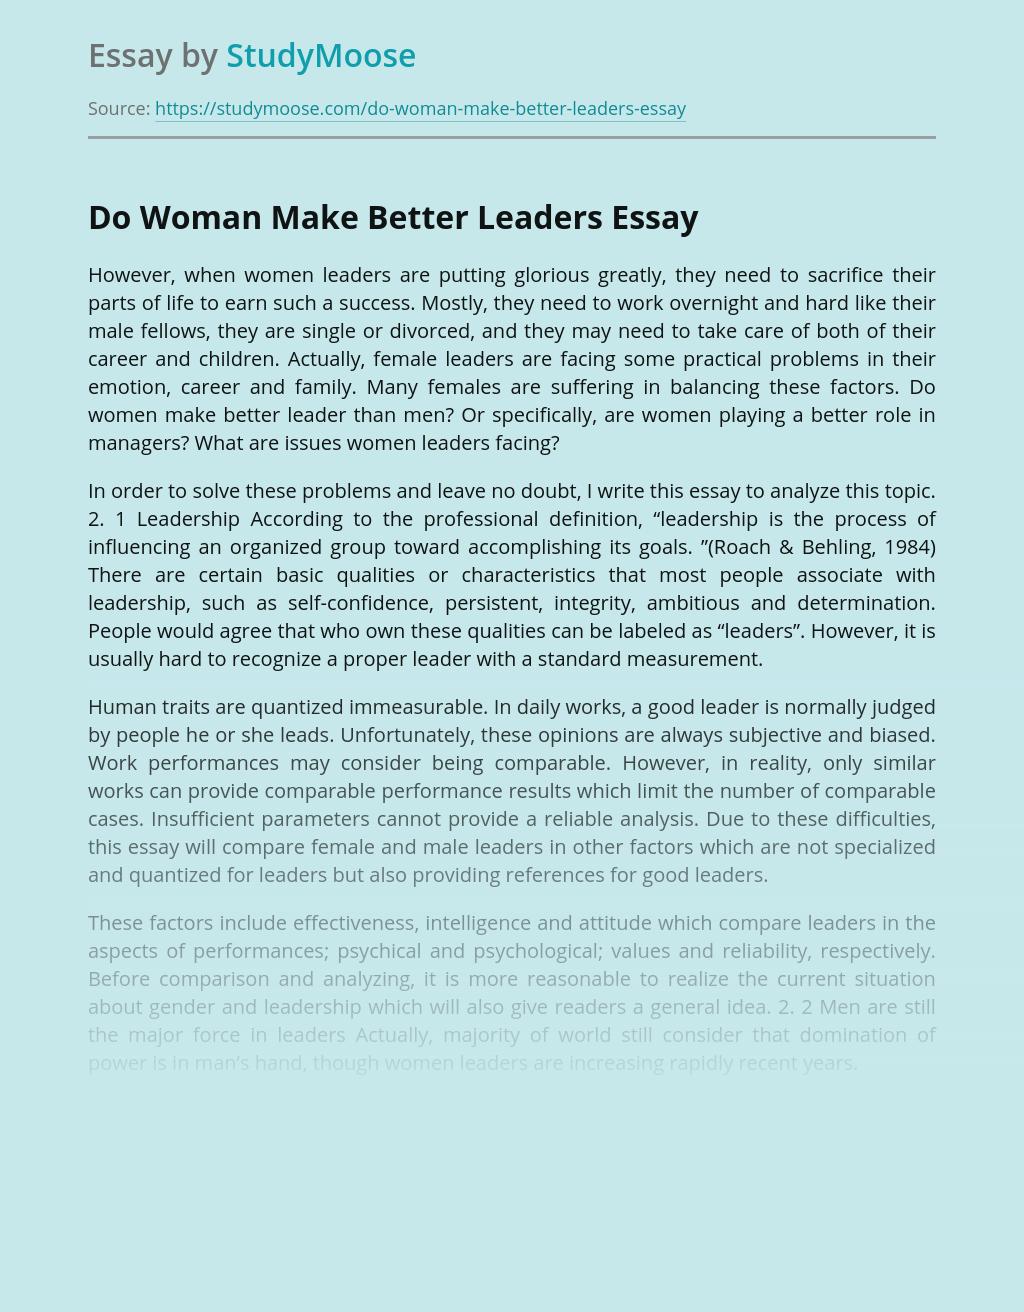 Do Woman Make Better Leaders